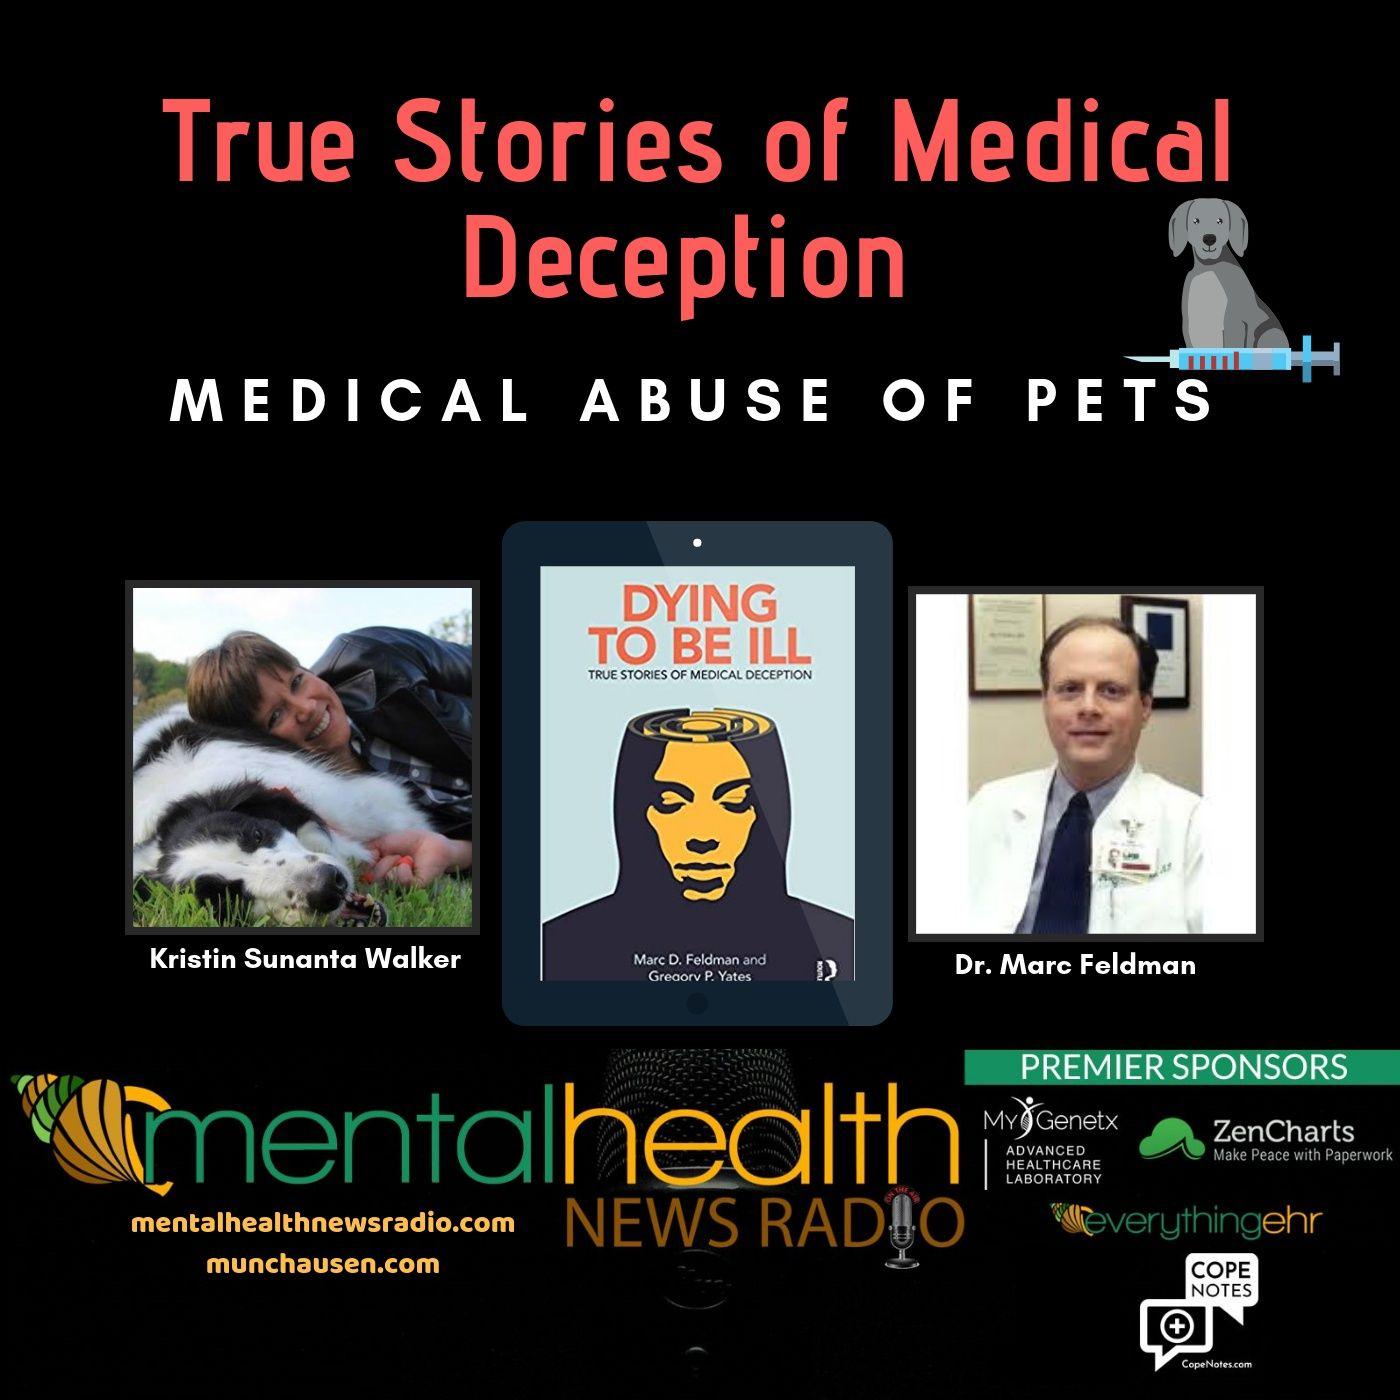 Mental Health News Radio - Medical Abuse of Pets with Dr. Marc Feldman